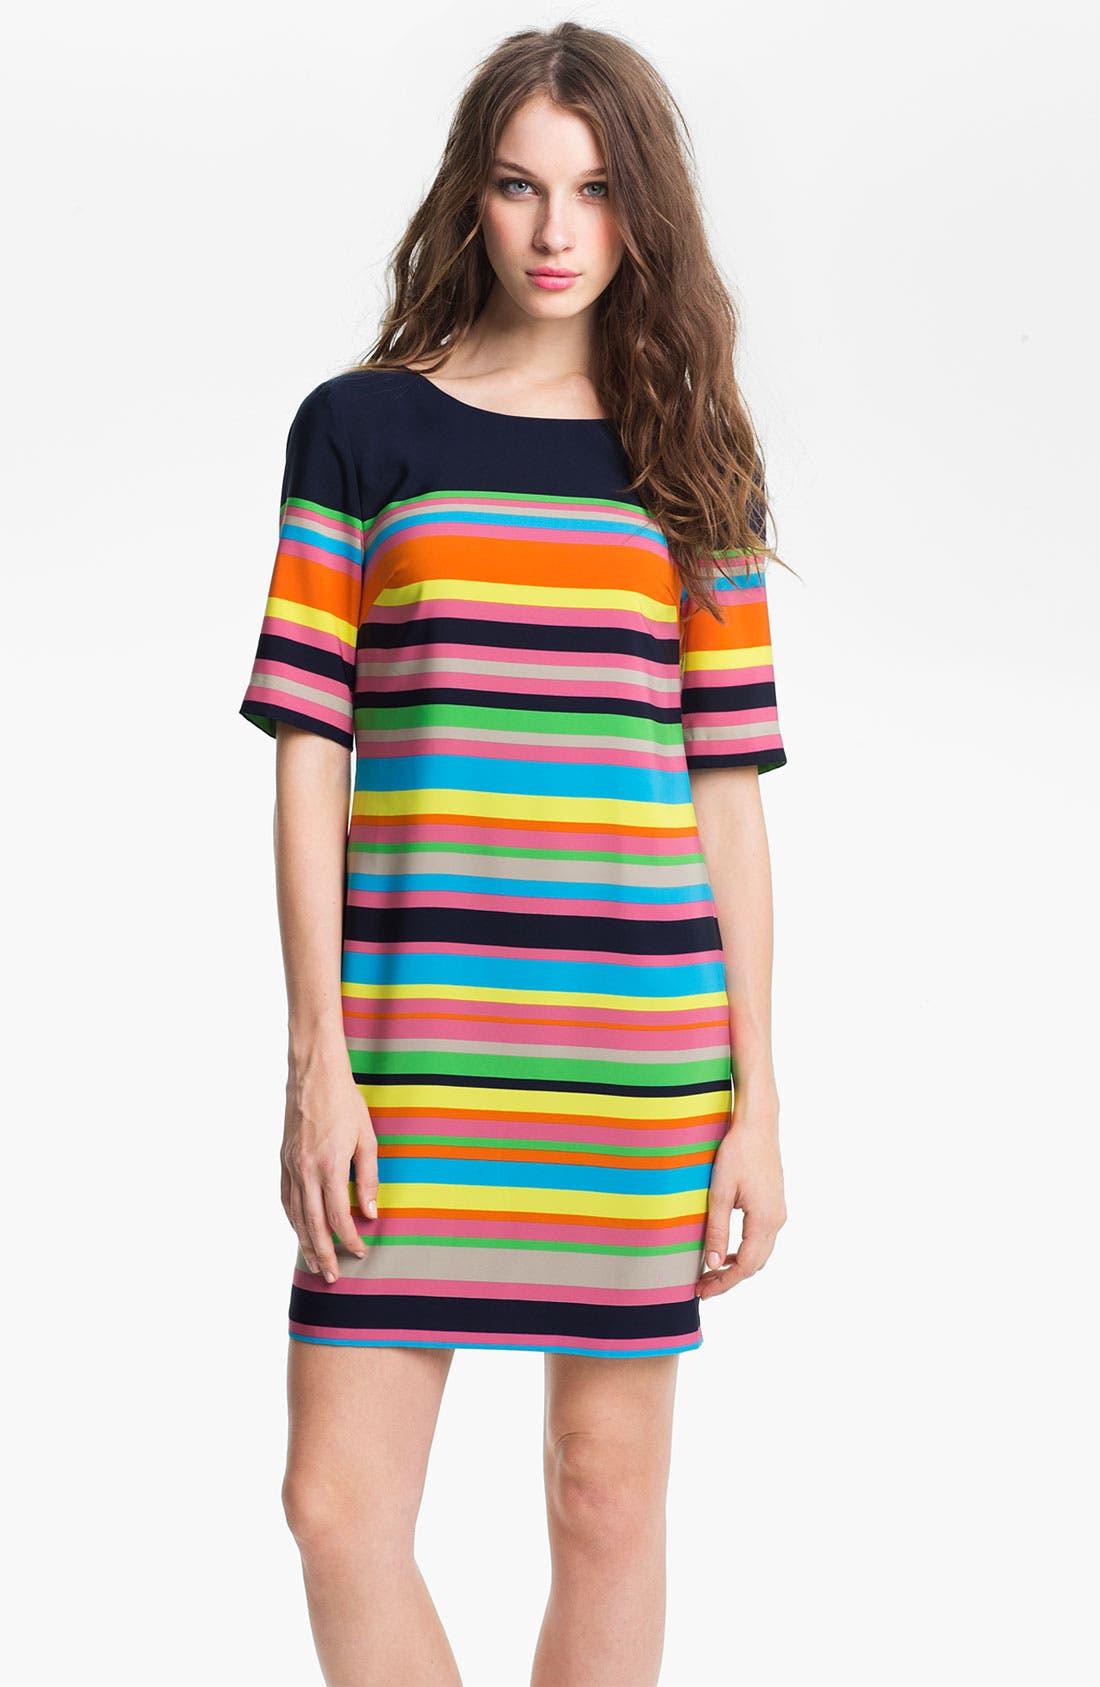 Alternate Image 1 Selected - Trina Turk 'Flagimi' Stripe Shift Dress